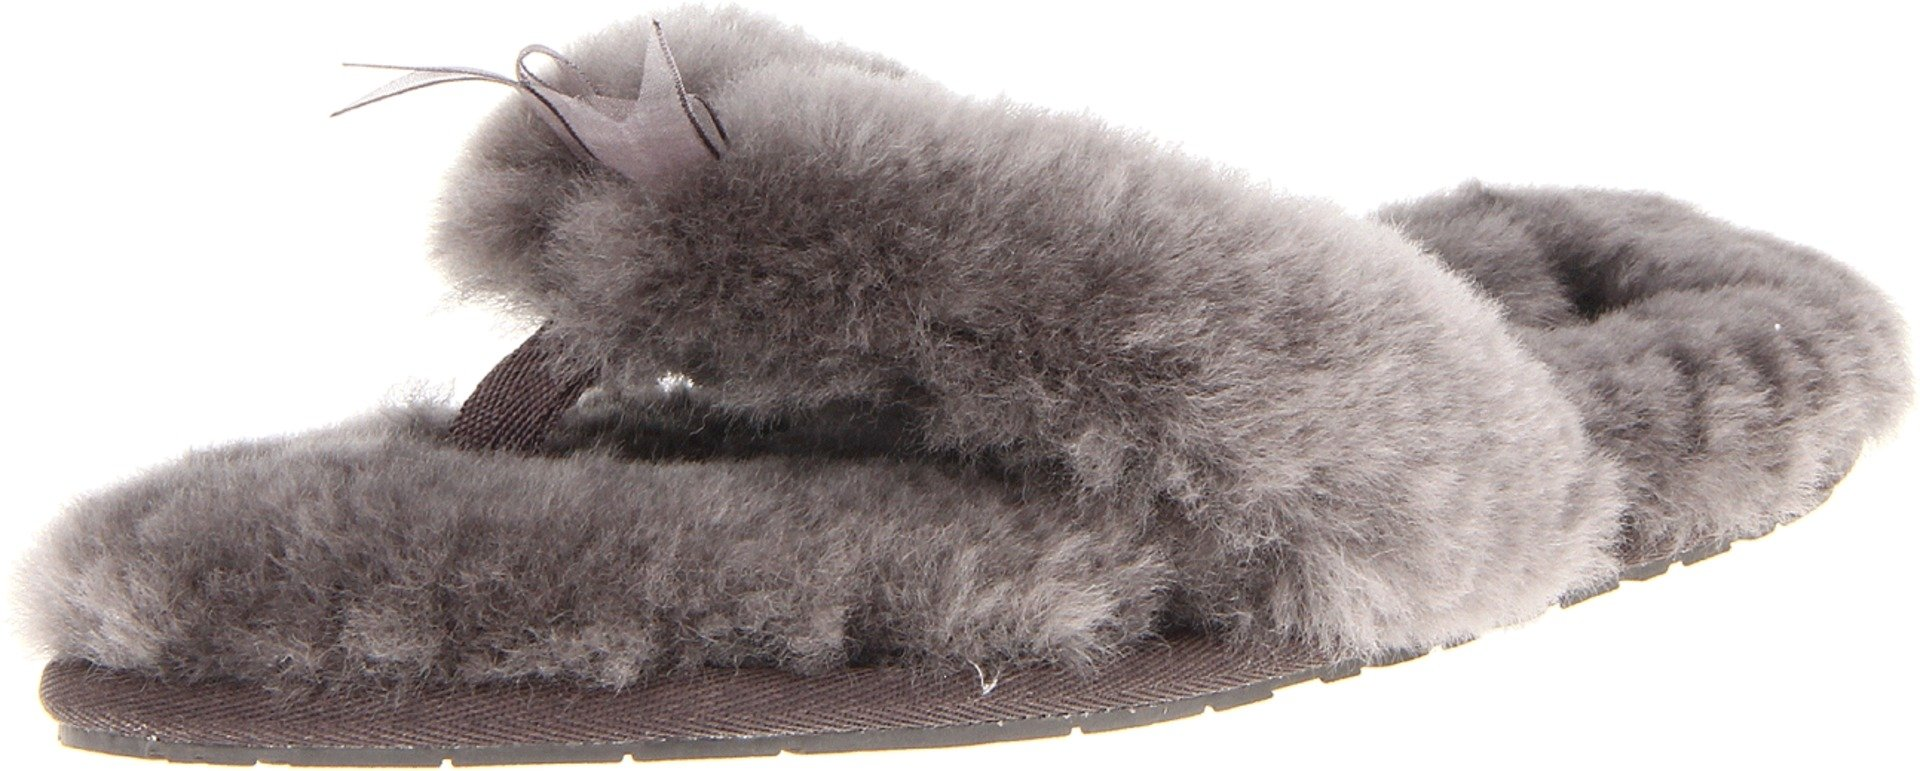 e8047eb4fda7 UGG Women s Fluff Flip Flop II Slip On Slipper Grey 10 B US Sheepskin  Imported